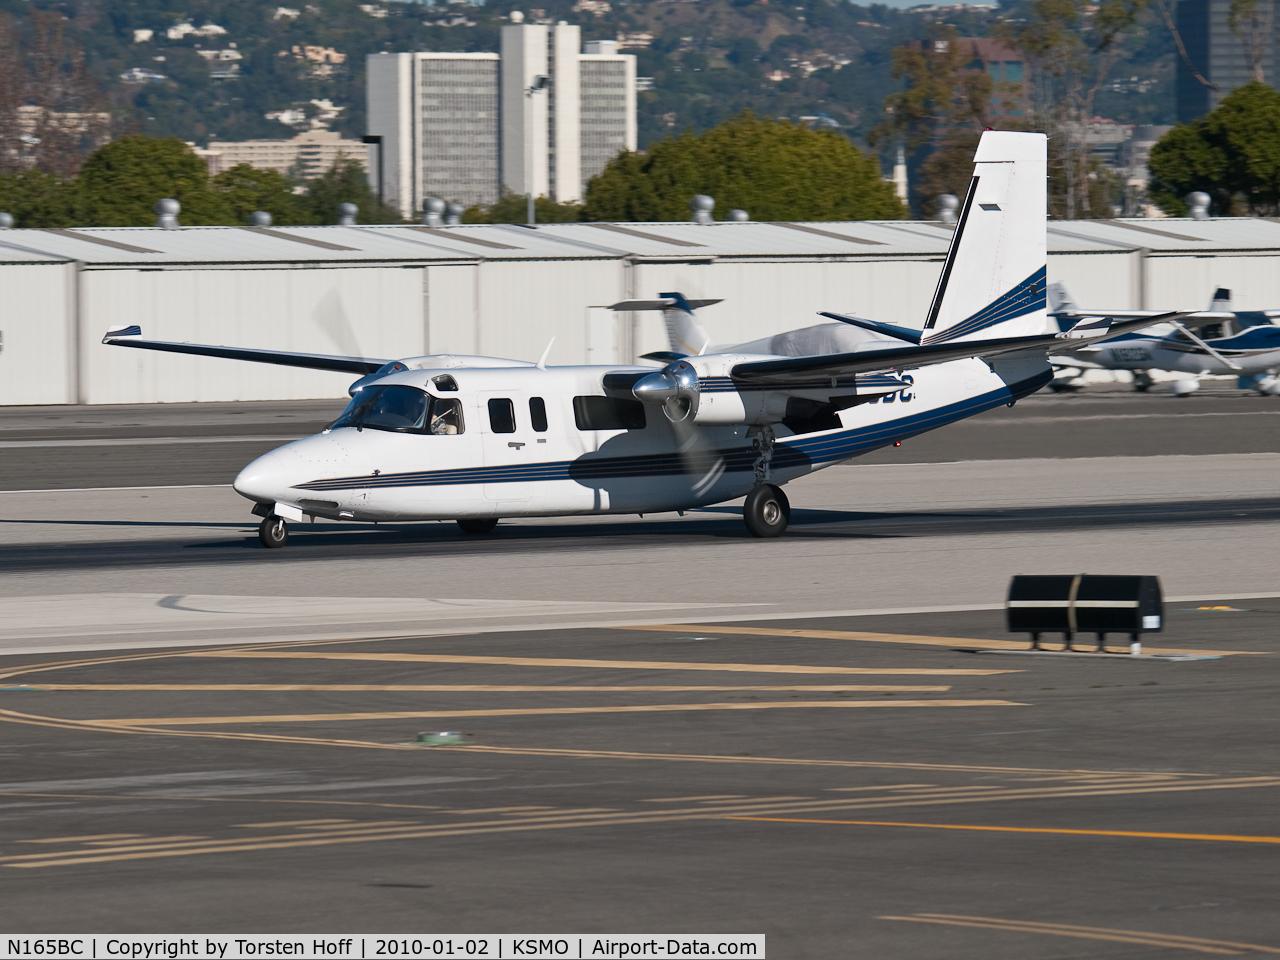 N165BC, 1980 Rockwell International 690C C/N 11646, N165BC departing from RWY 21